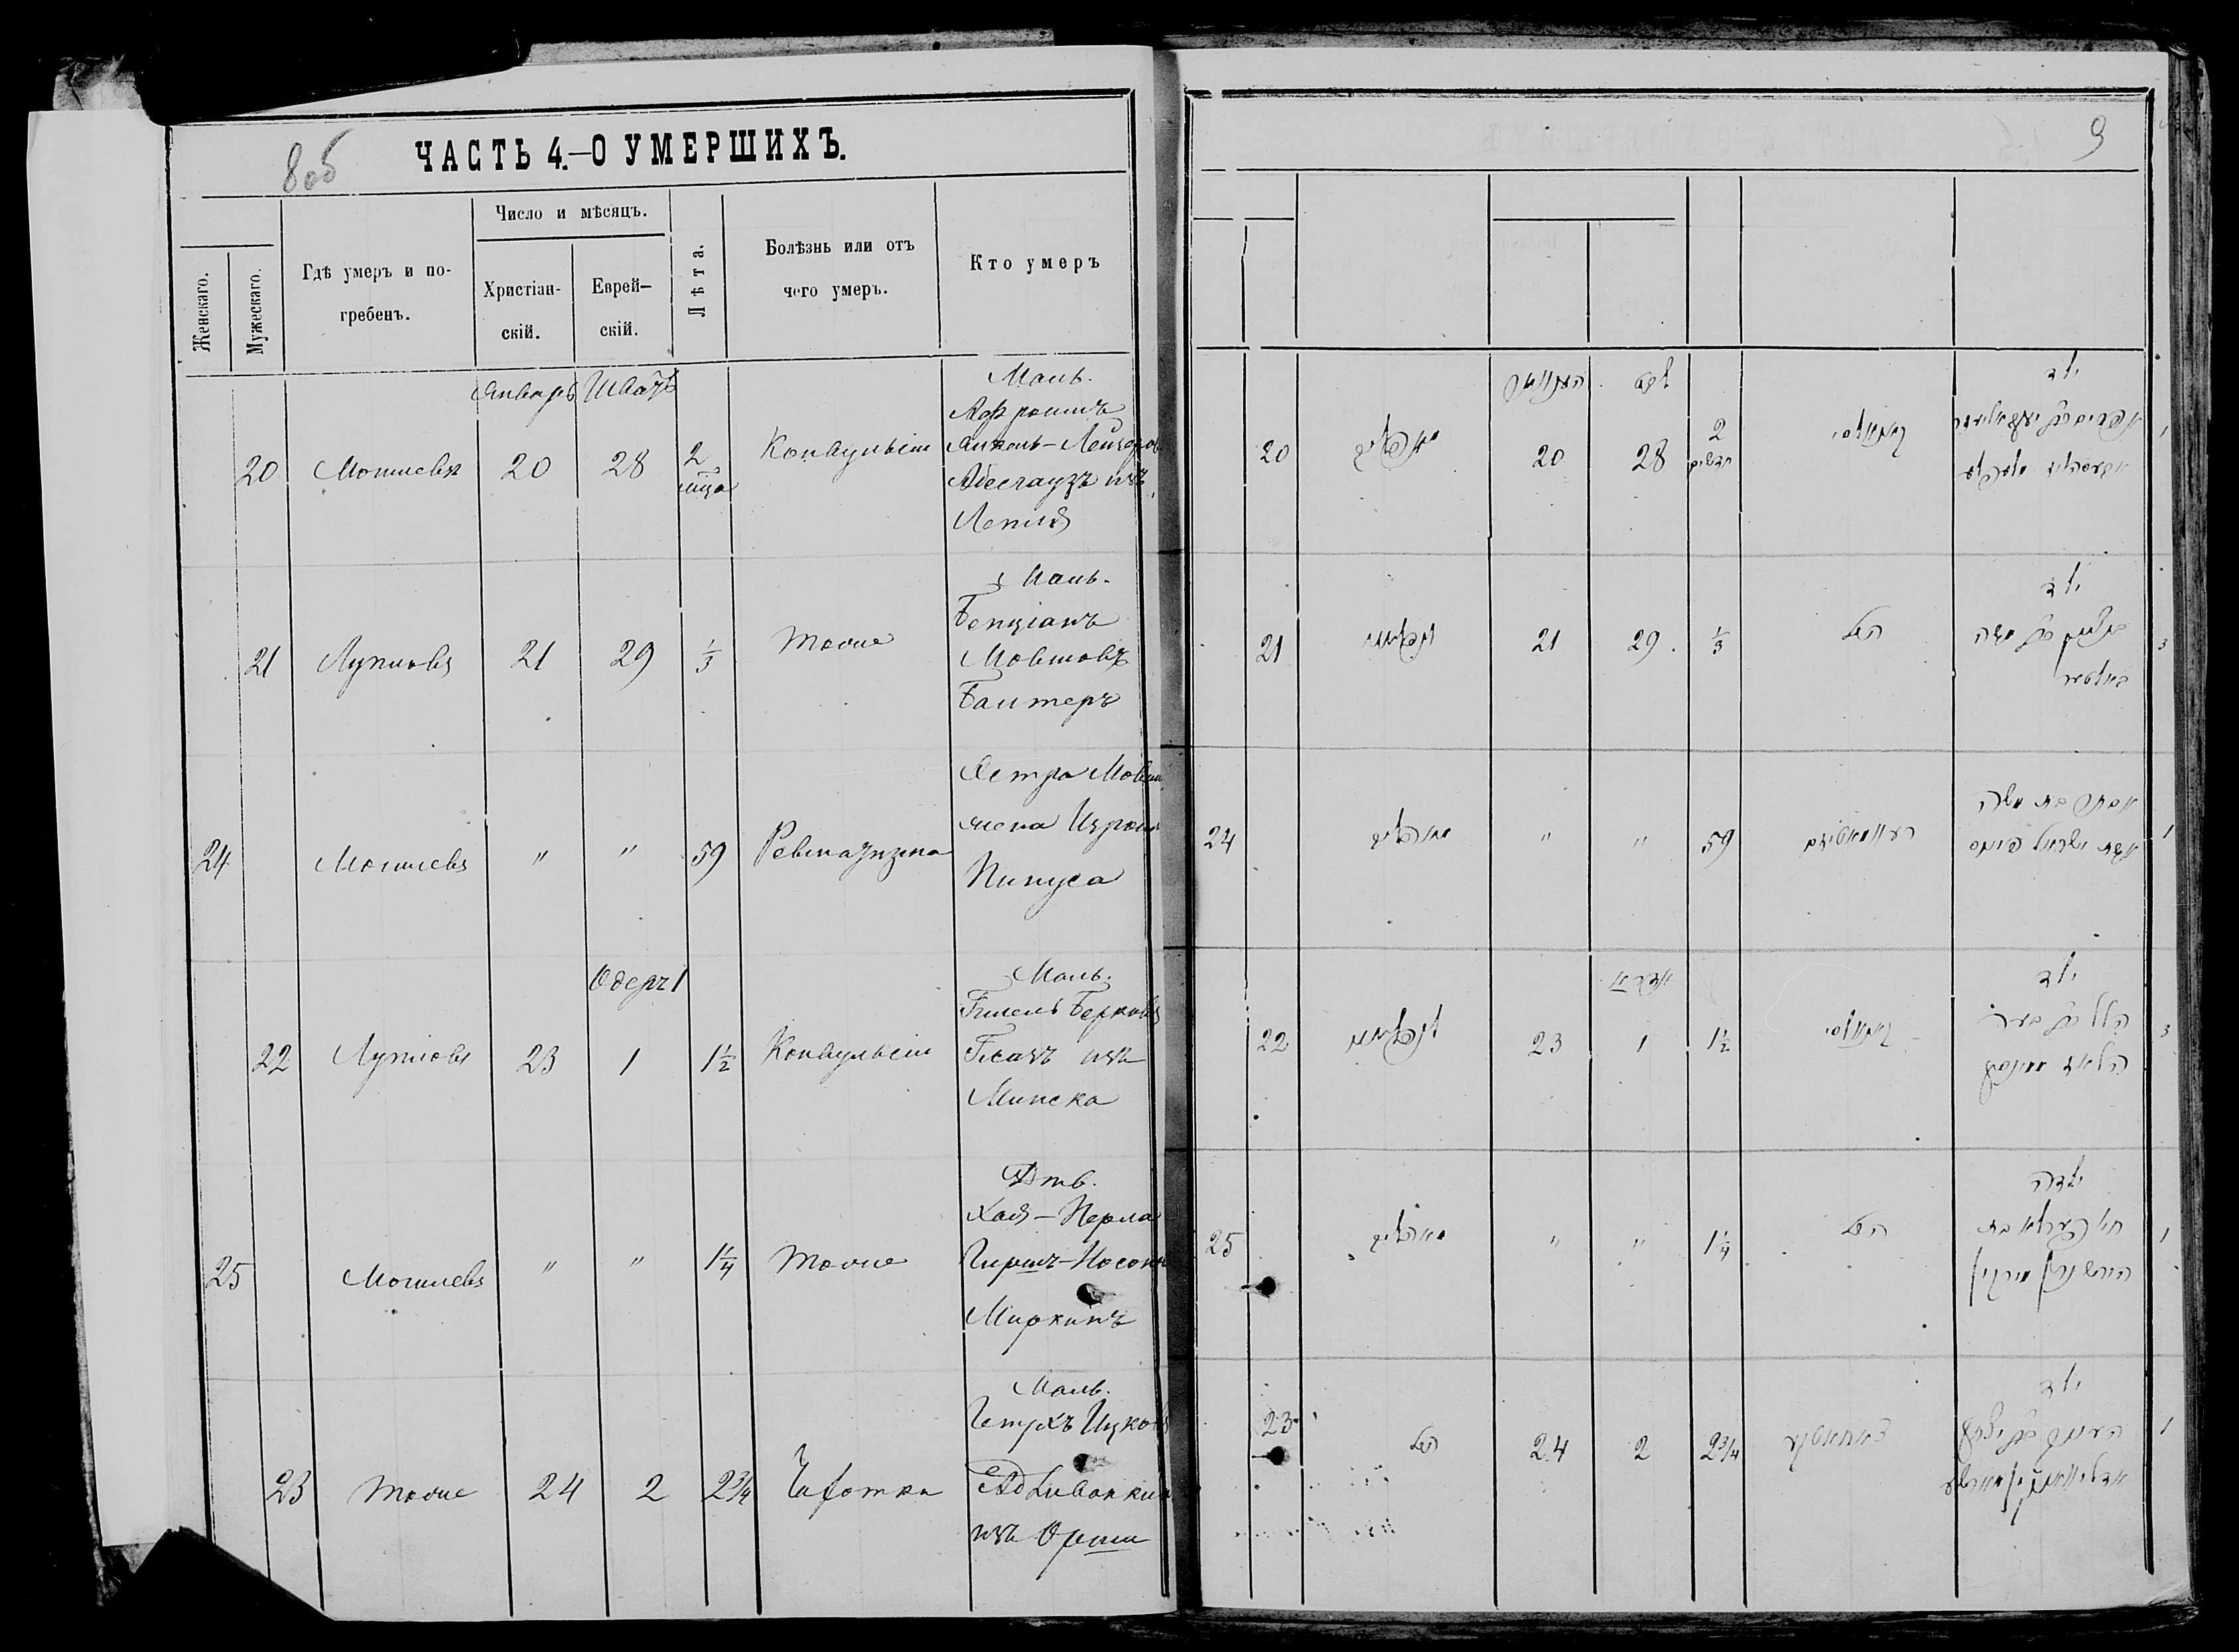 Хая-Перла Гирш-Носоновна Миркина 23 января 1878, запись 25, пленка 007766481, снимок 123